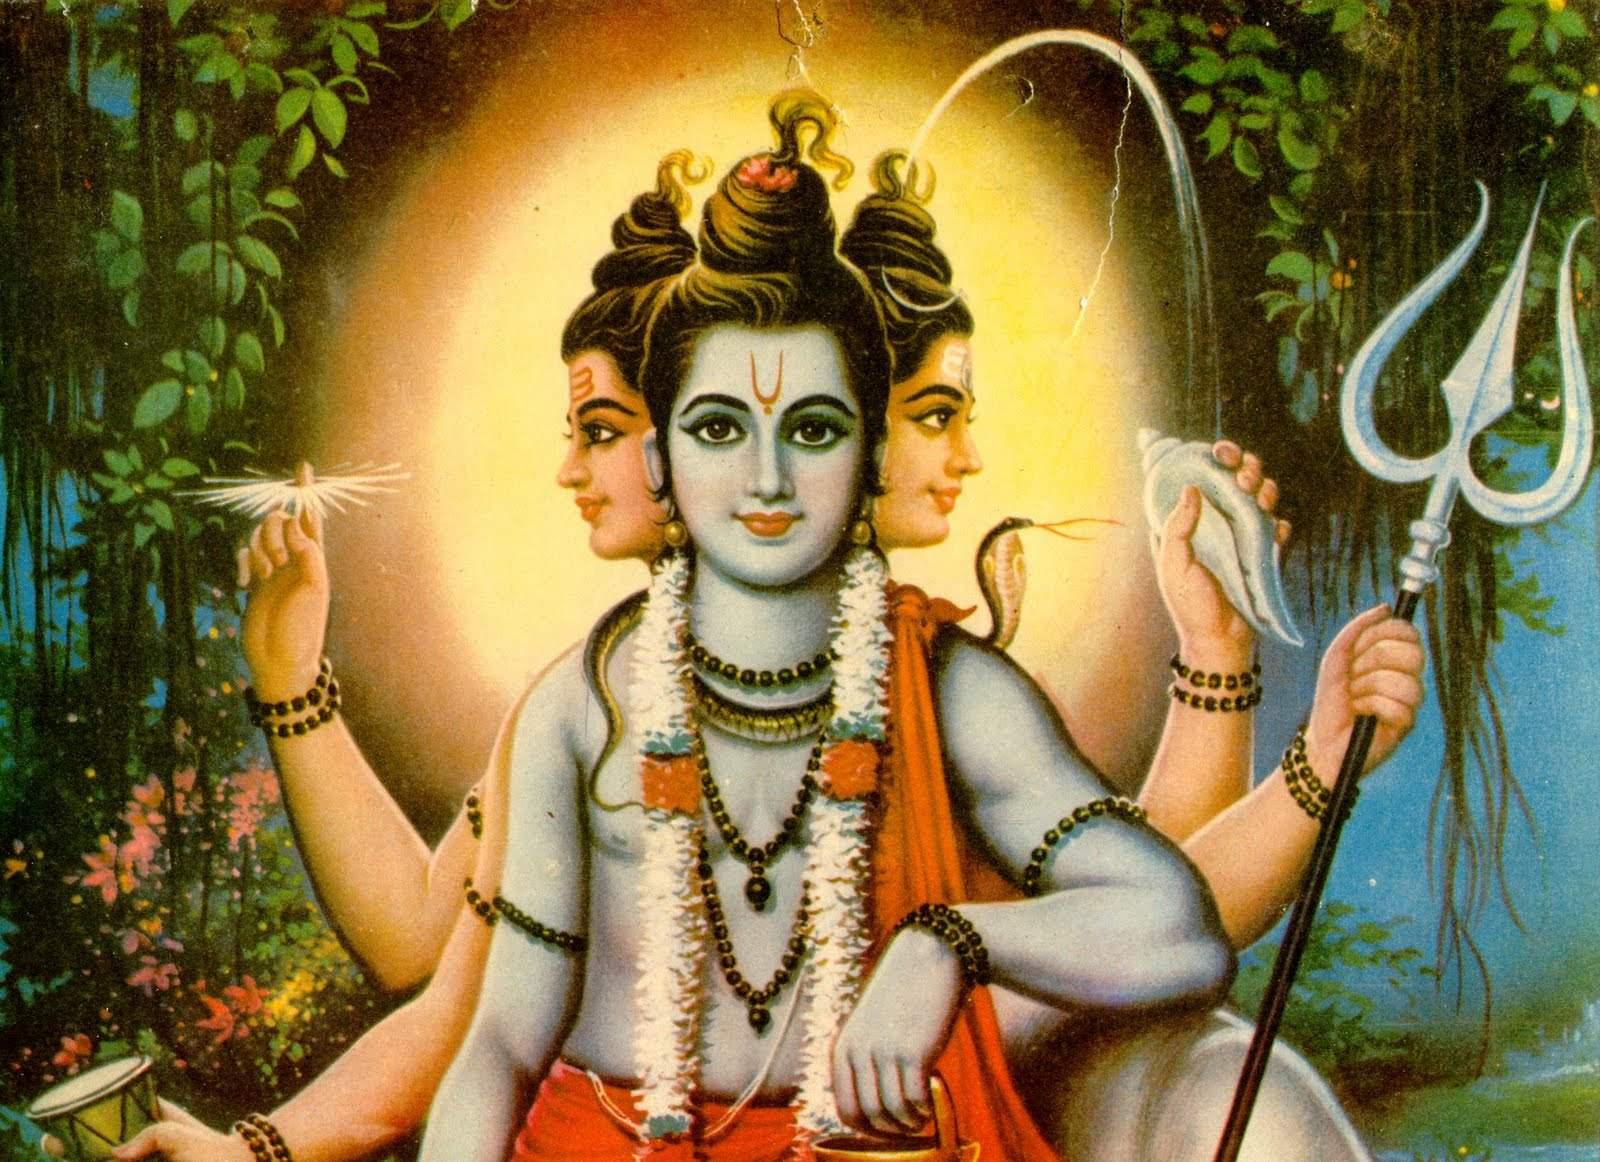 hindu single men in mesopotamia Meeting nice single men in ashtabula can seem hopeless at times — ashtabula hindu singles mesopotamia men.